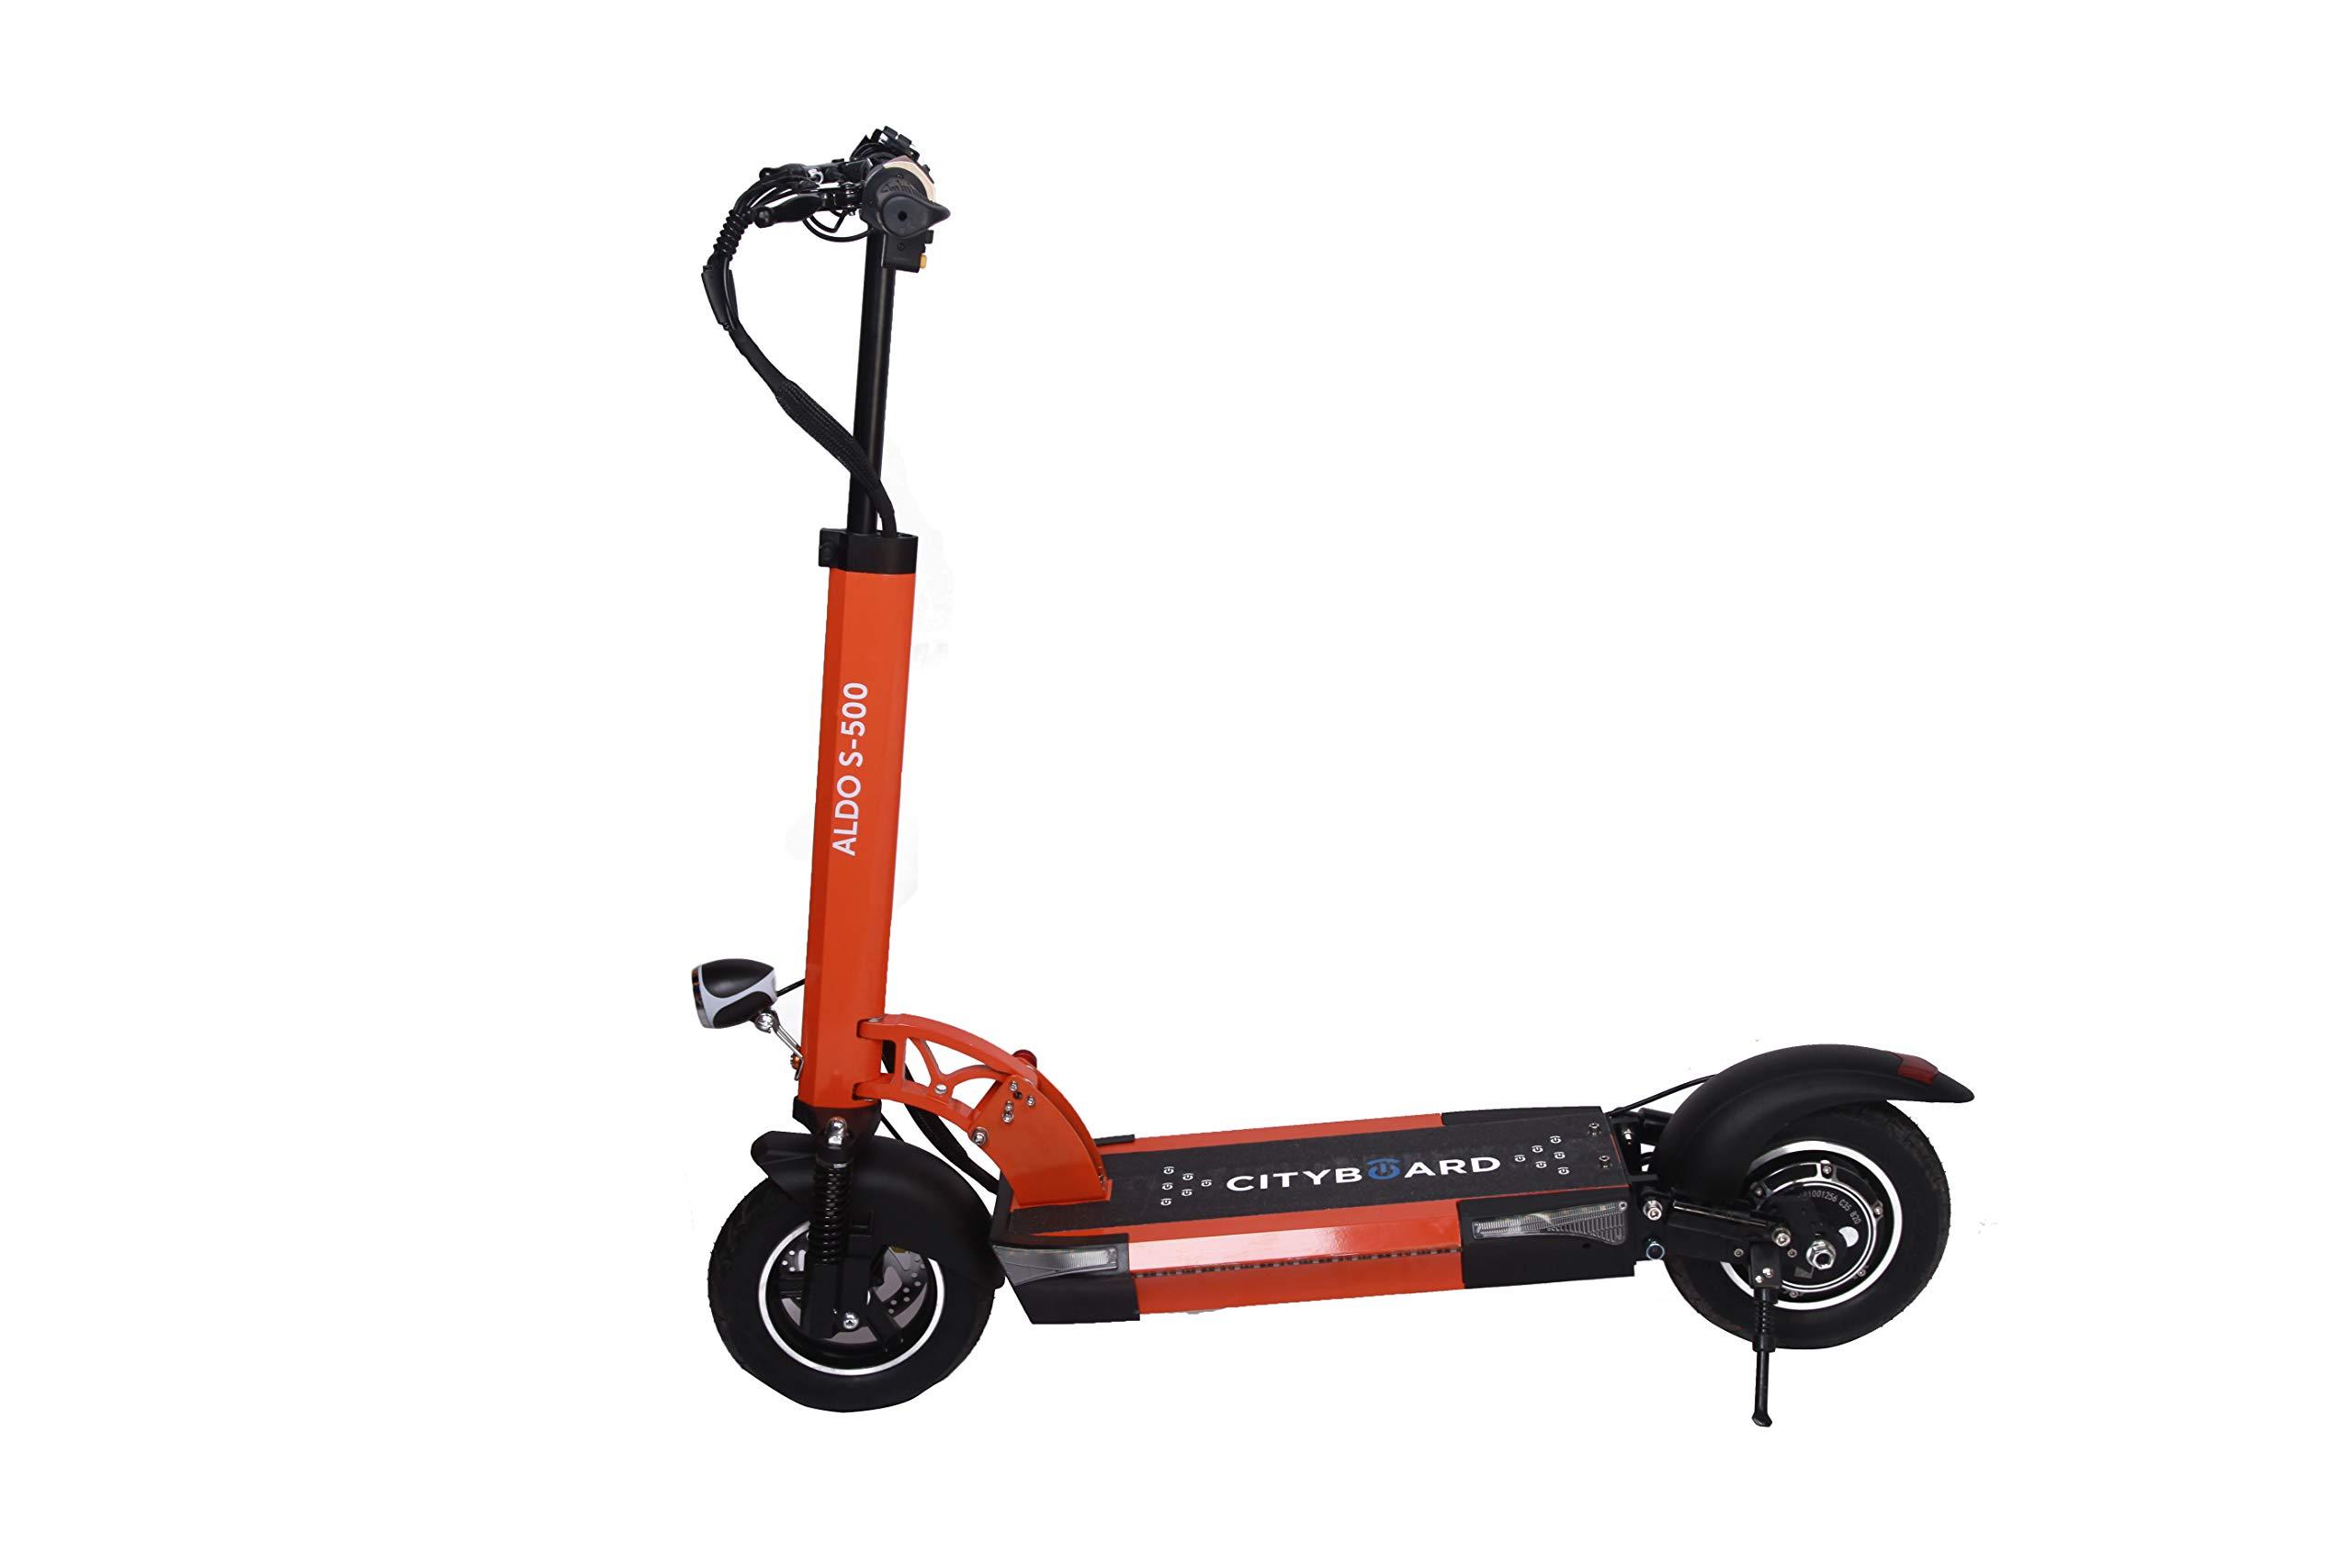 Comprar Cityboard Aldo S500 Patinete Electrico, Juventud Unisex, Orange Country, 105 x 52 x 100 cm